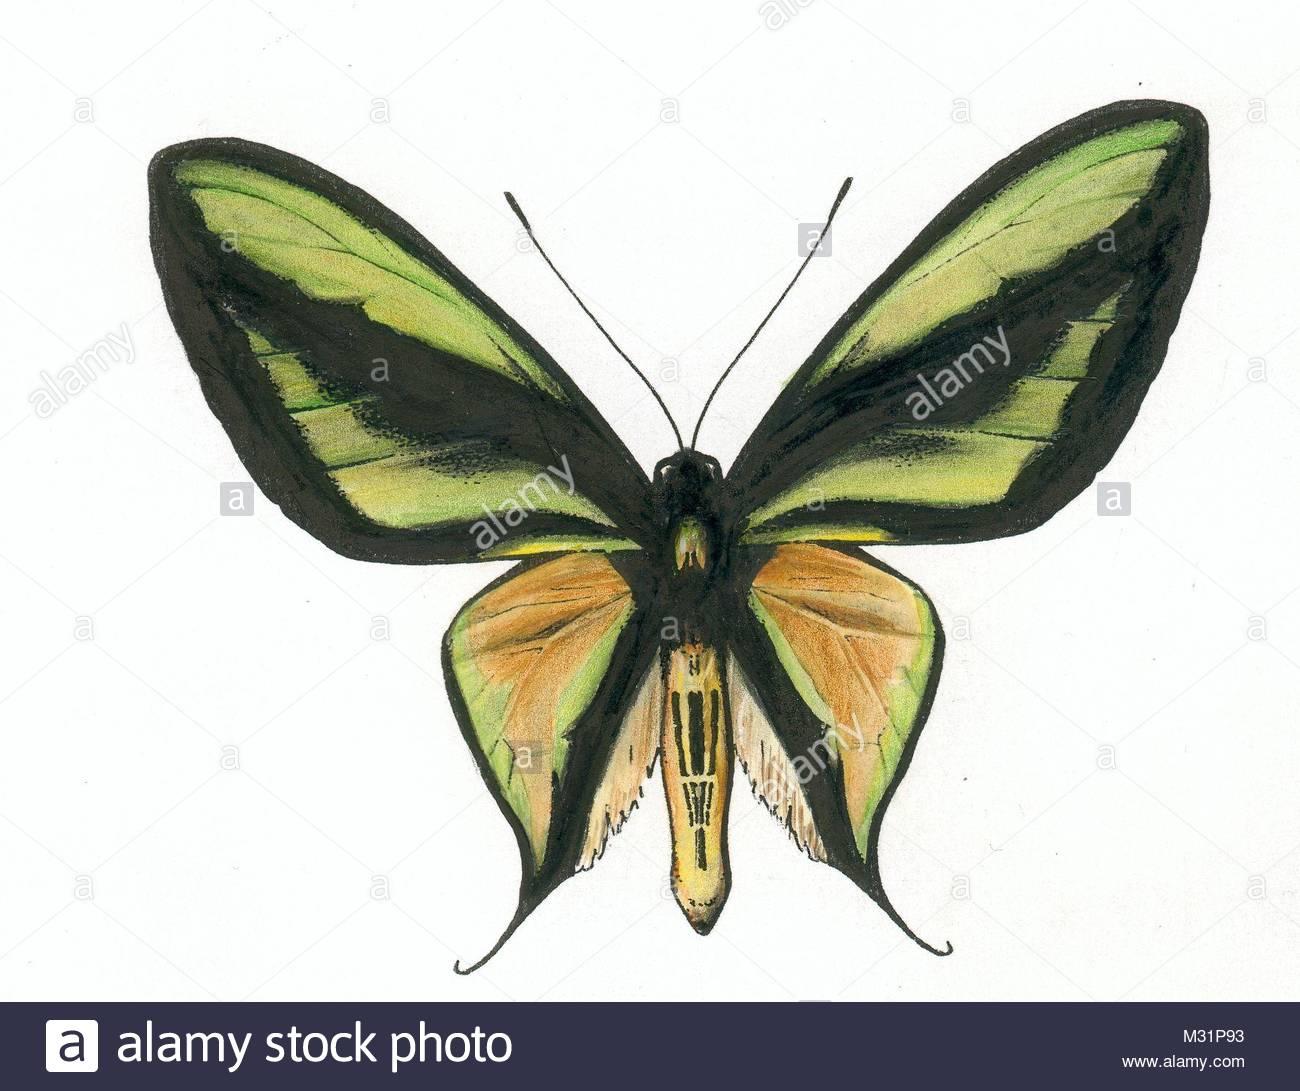 series butterflies series ornithoptera paradisea 5 - Stock Image